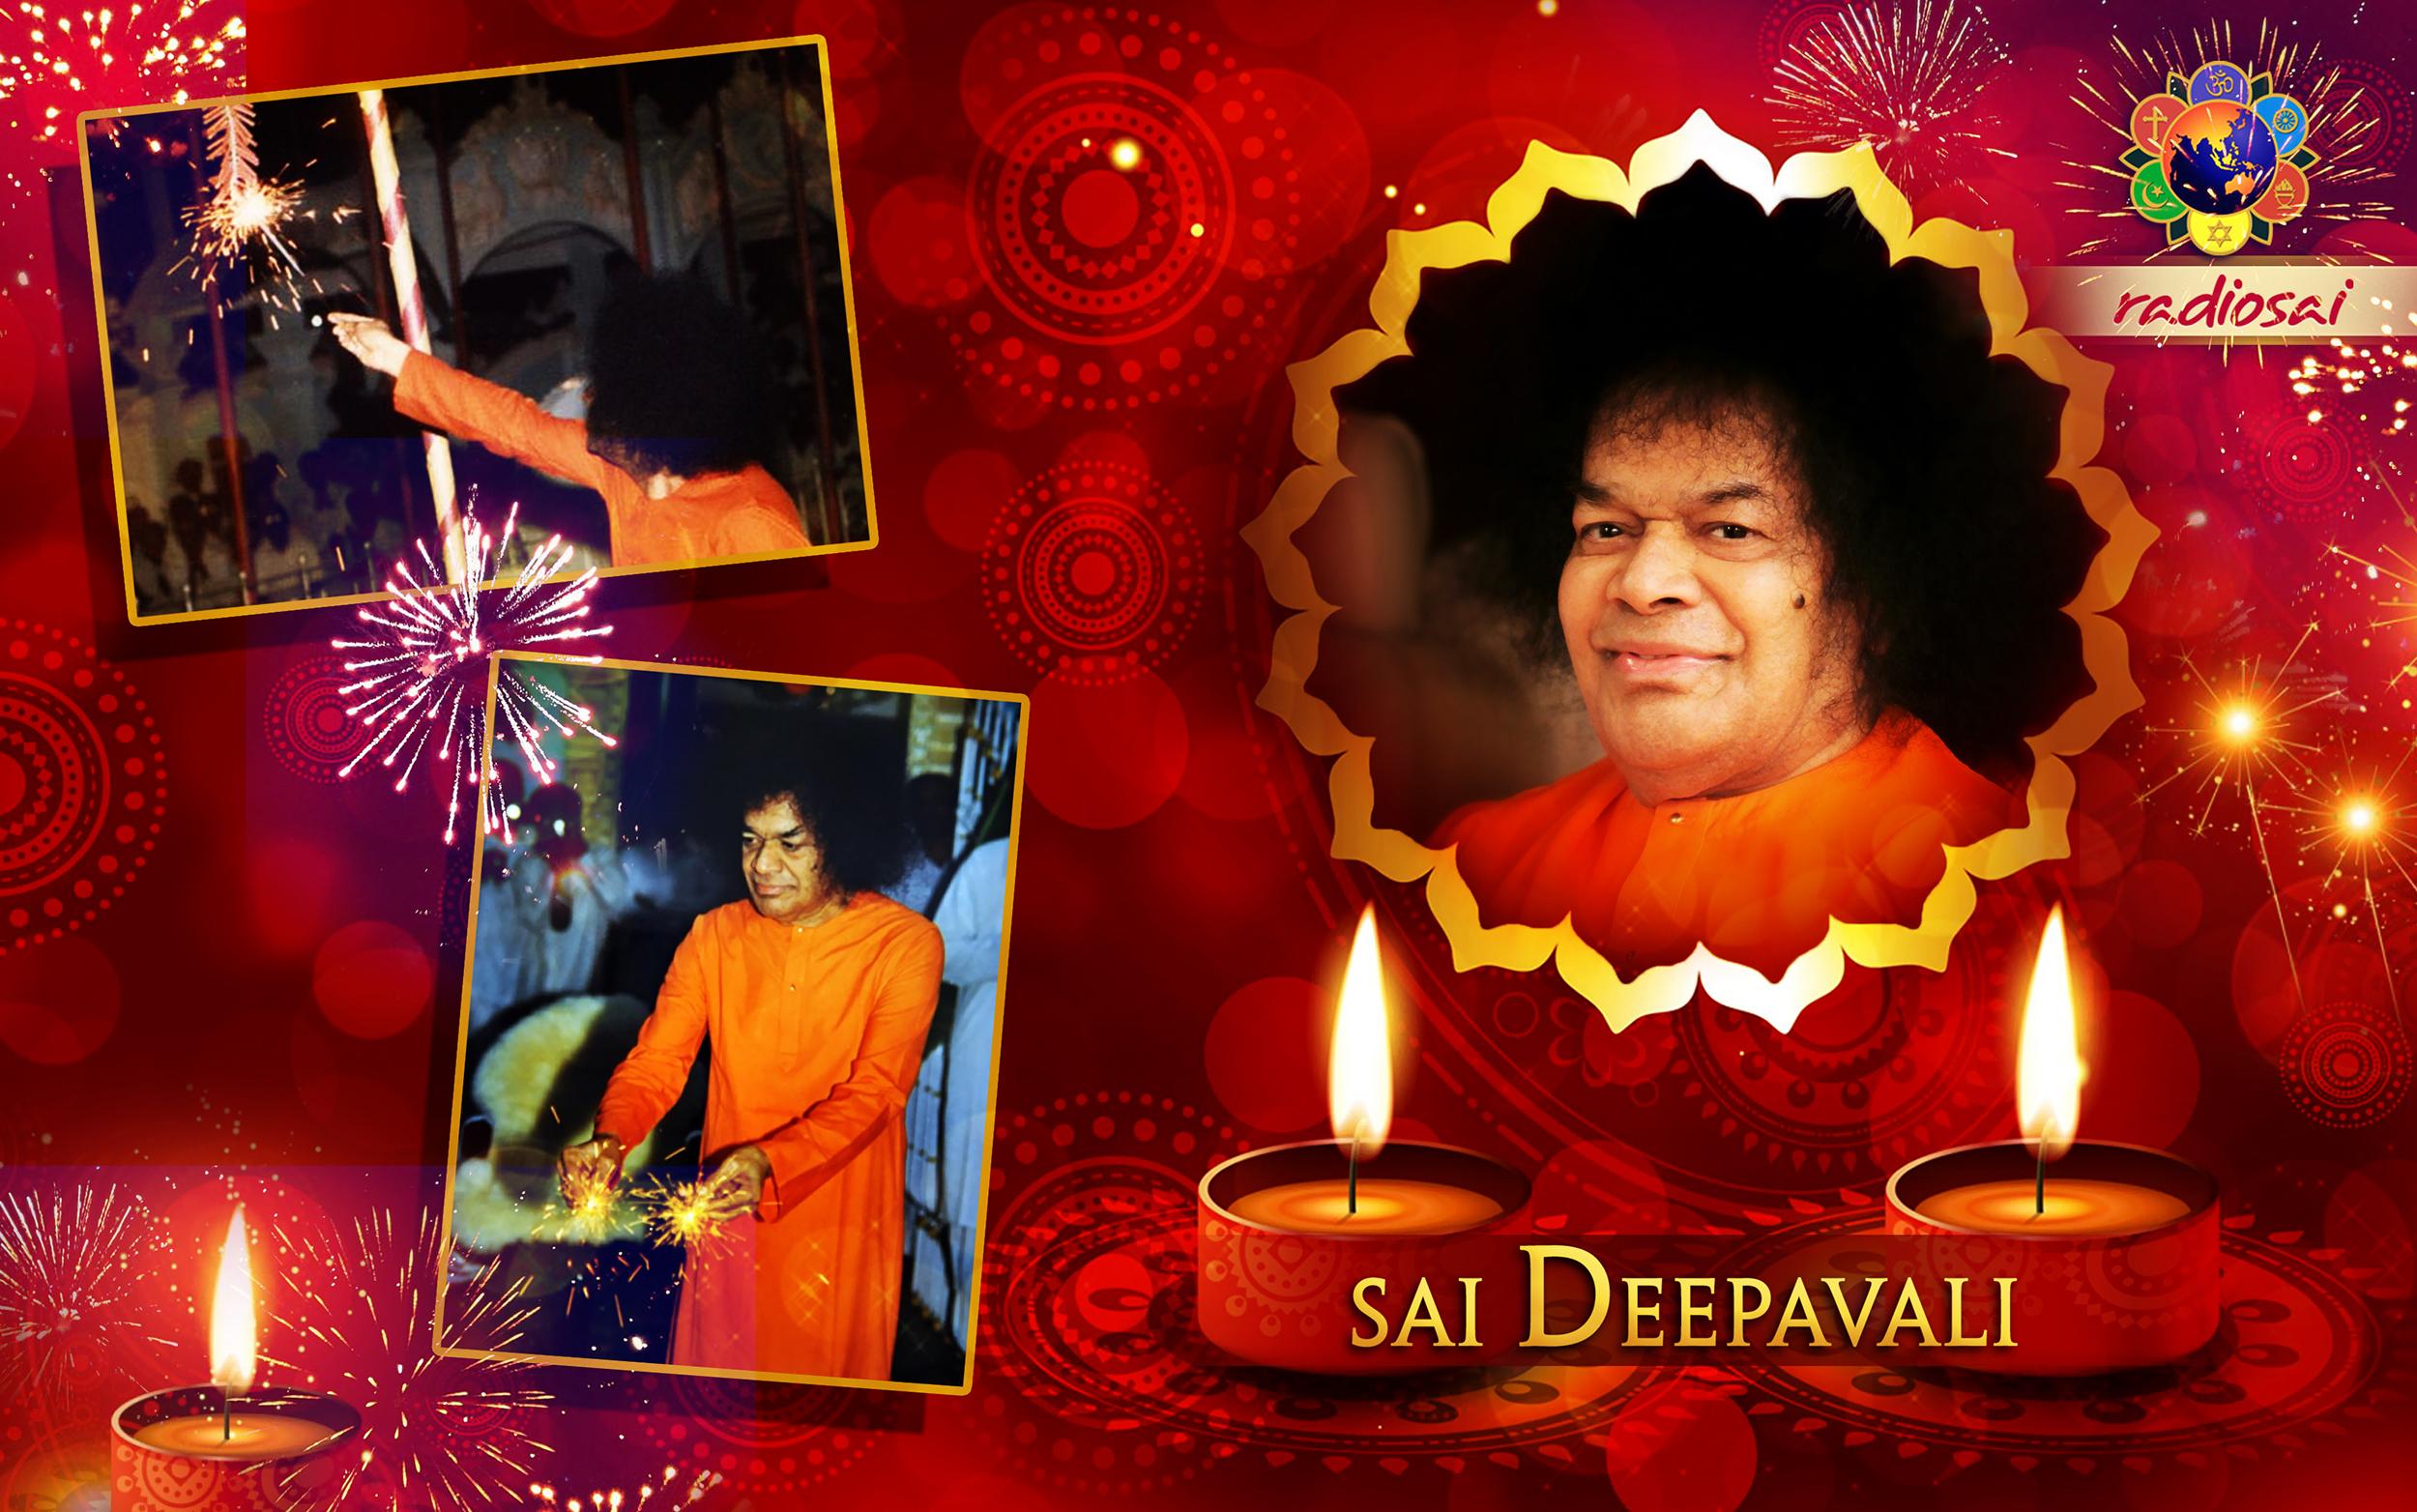 Deepavali-Radiosai-wallpaper-2014-01